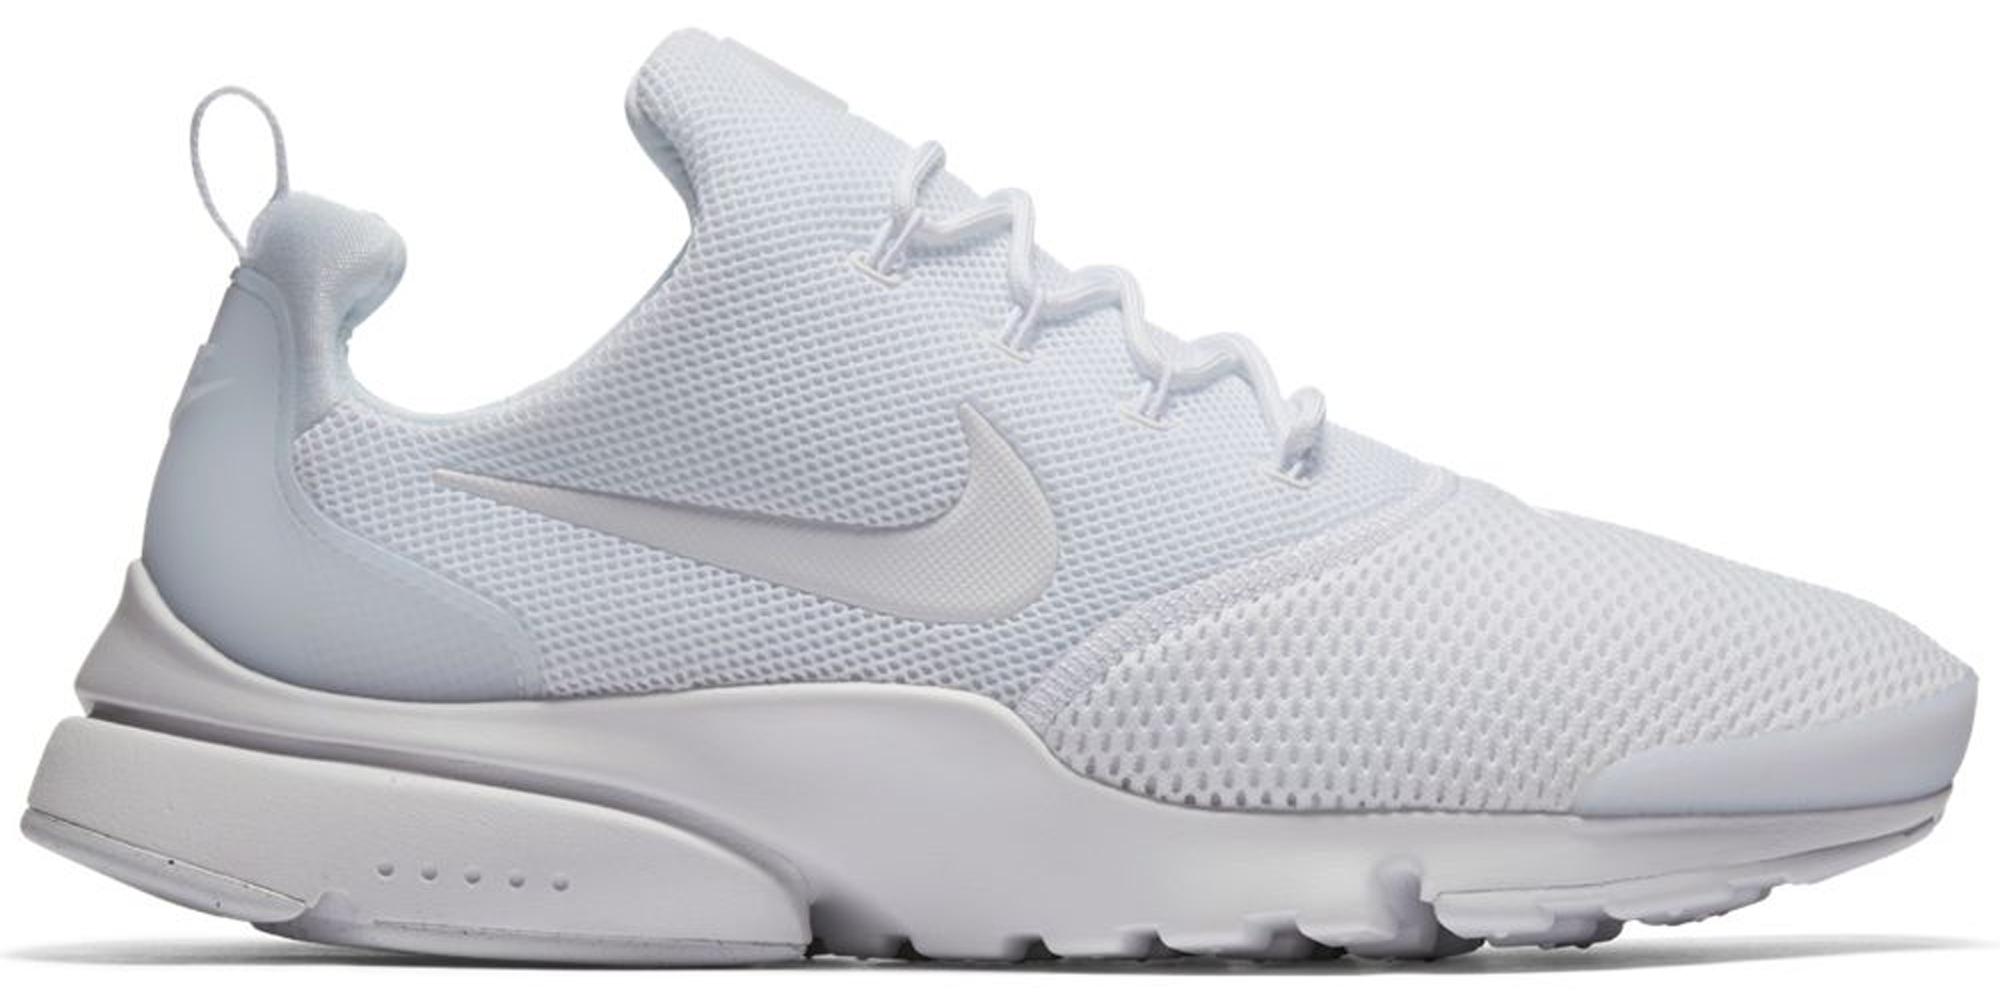 Nike Presto Fly Triple White - 908019-100